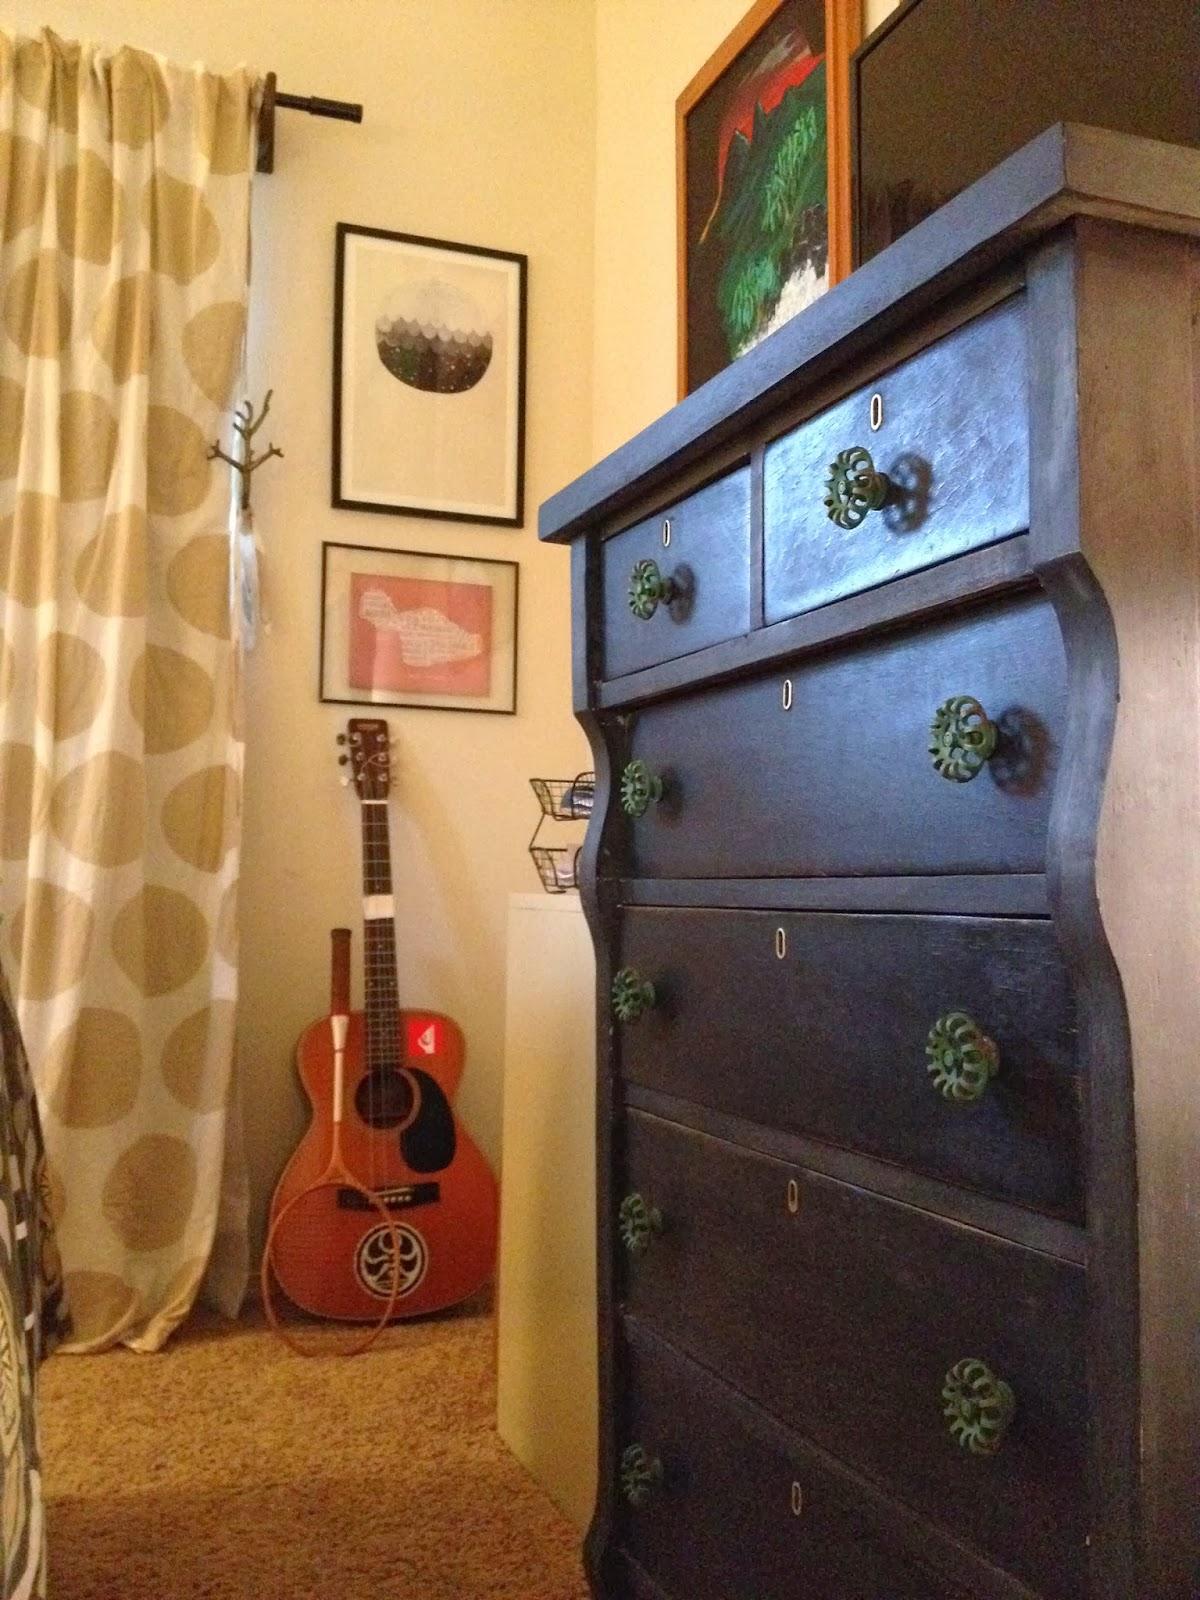 black antique dresser wizard of oz polka dot curtains guitar tennis racket